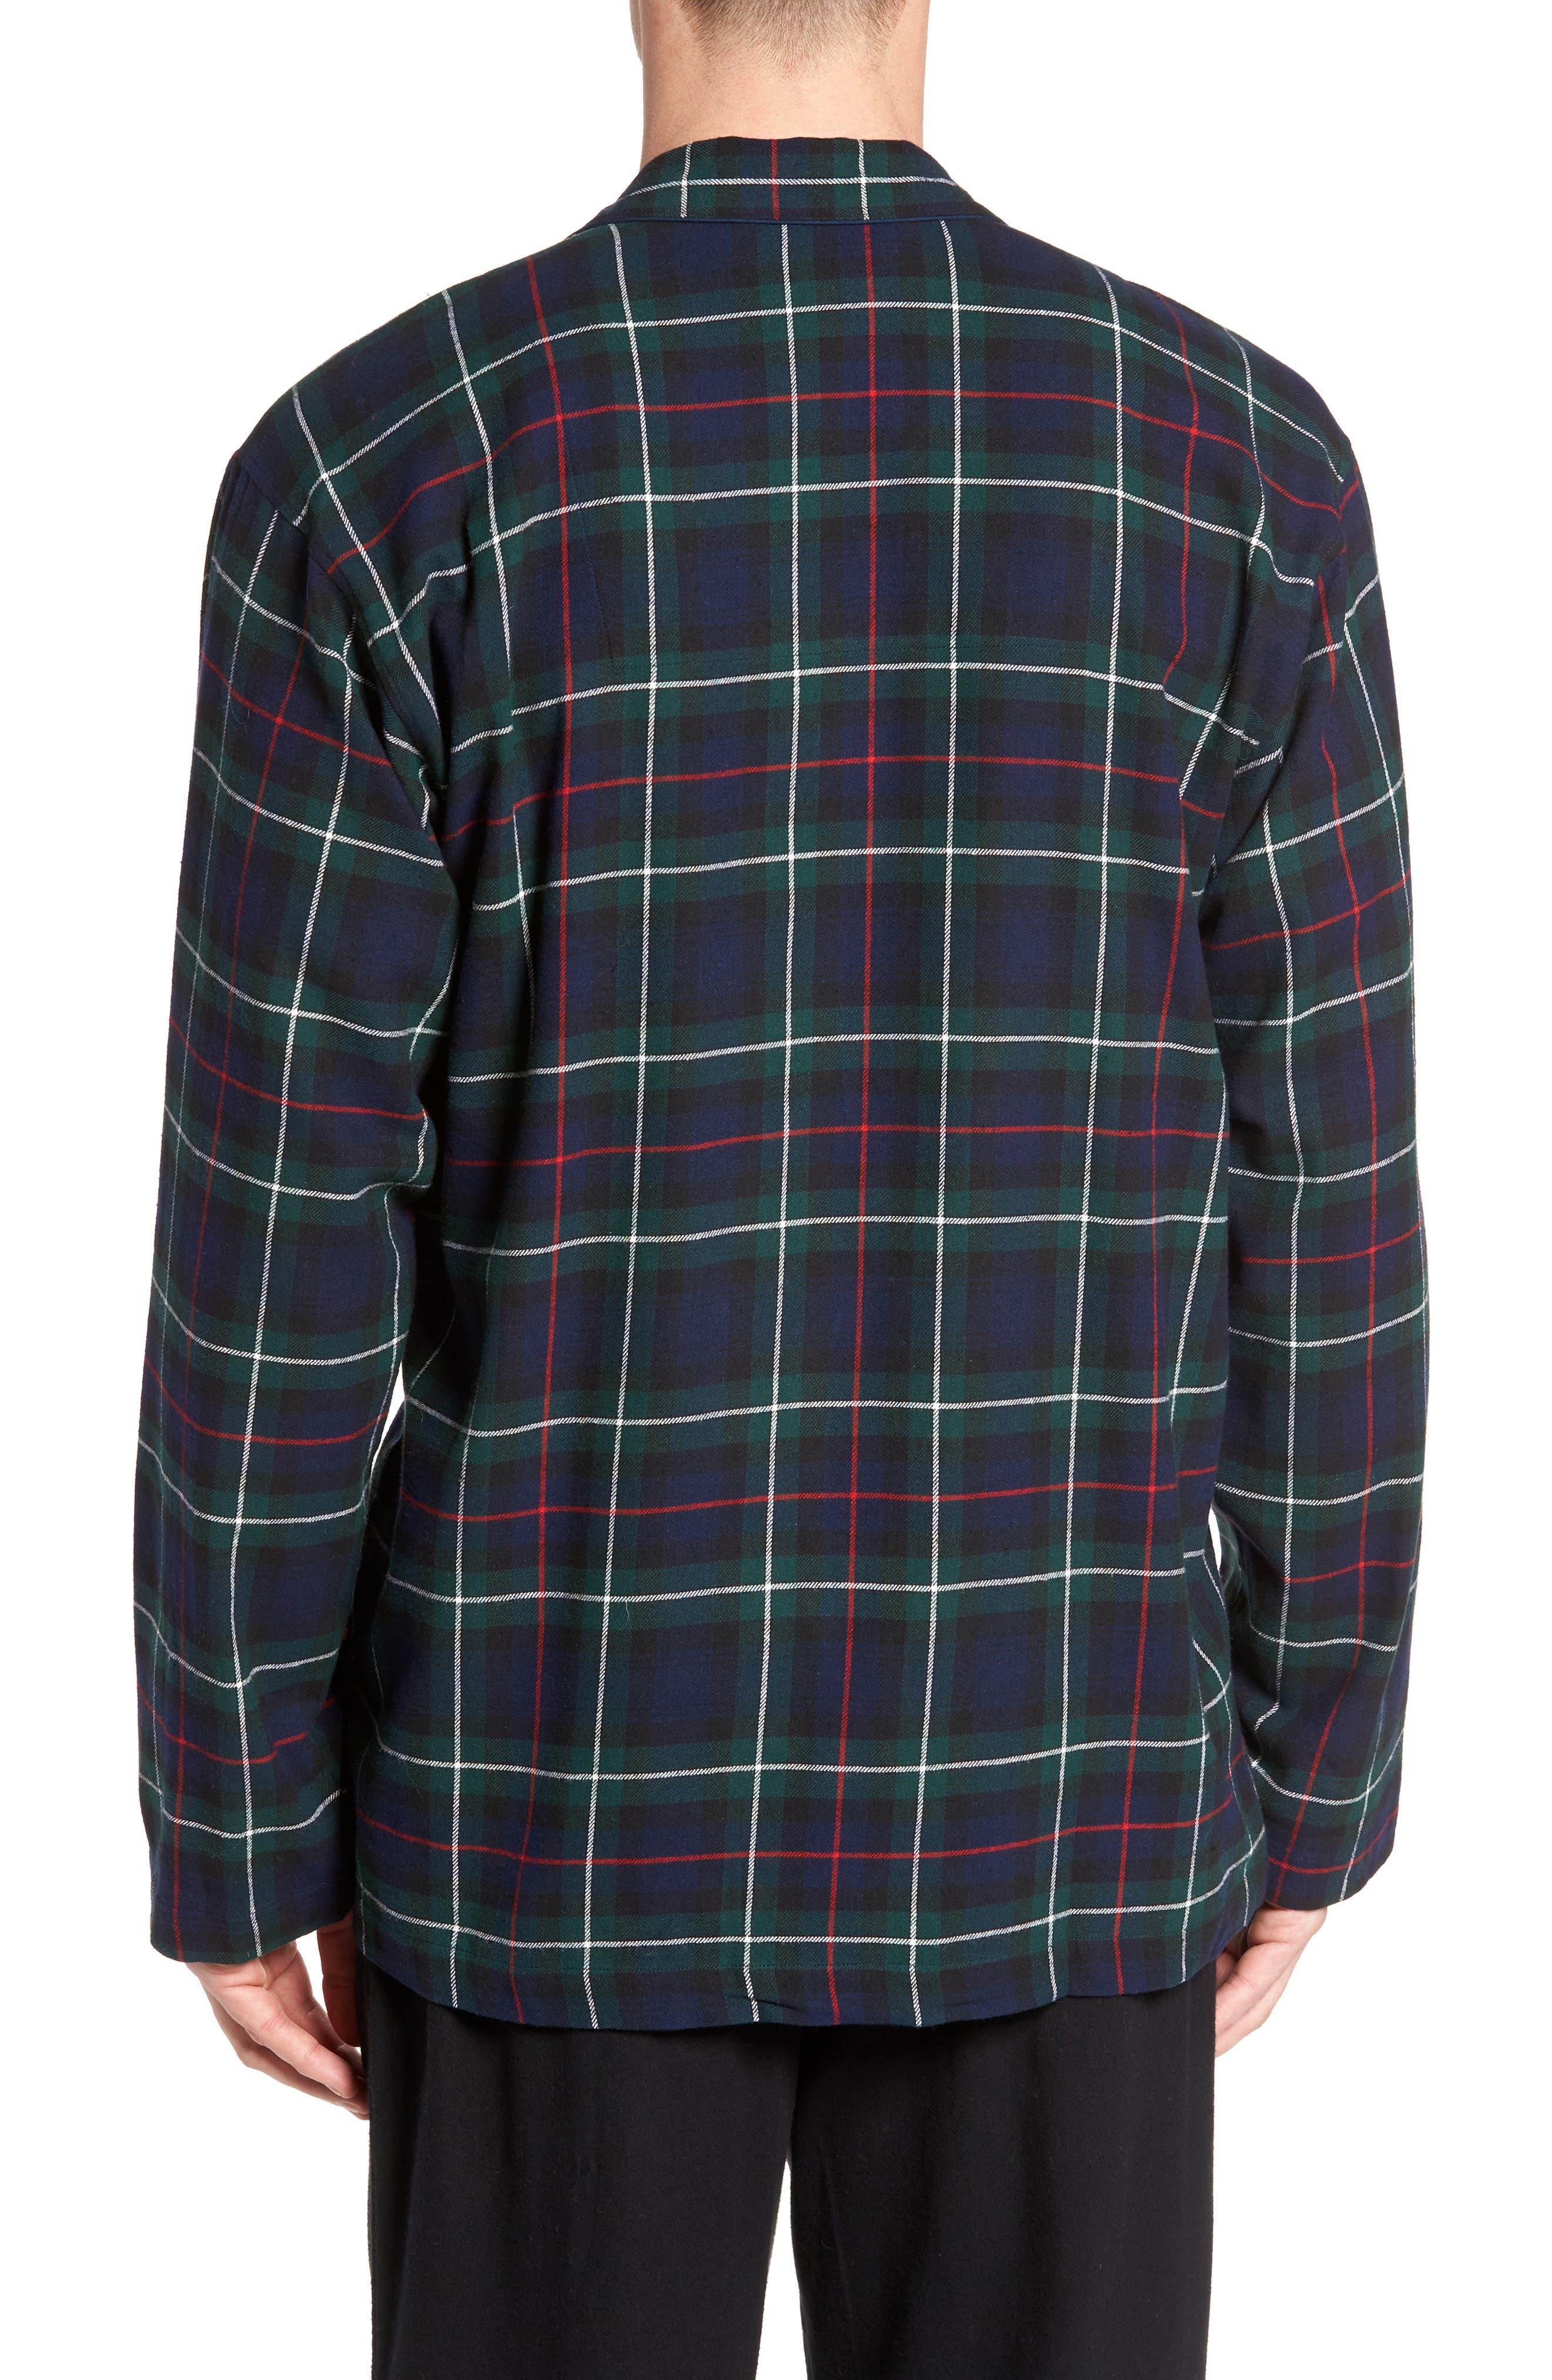 Polo Ralph Lauren Flannel Pajama Shirt,                             Alternate thumbnail 6, color,